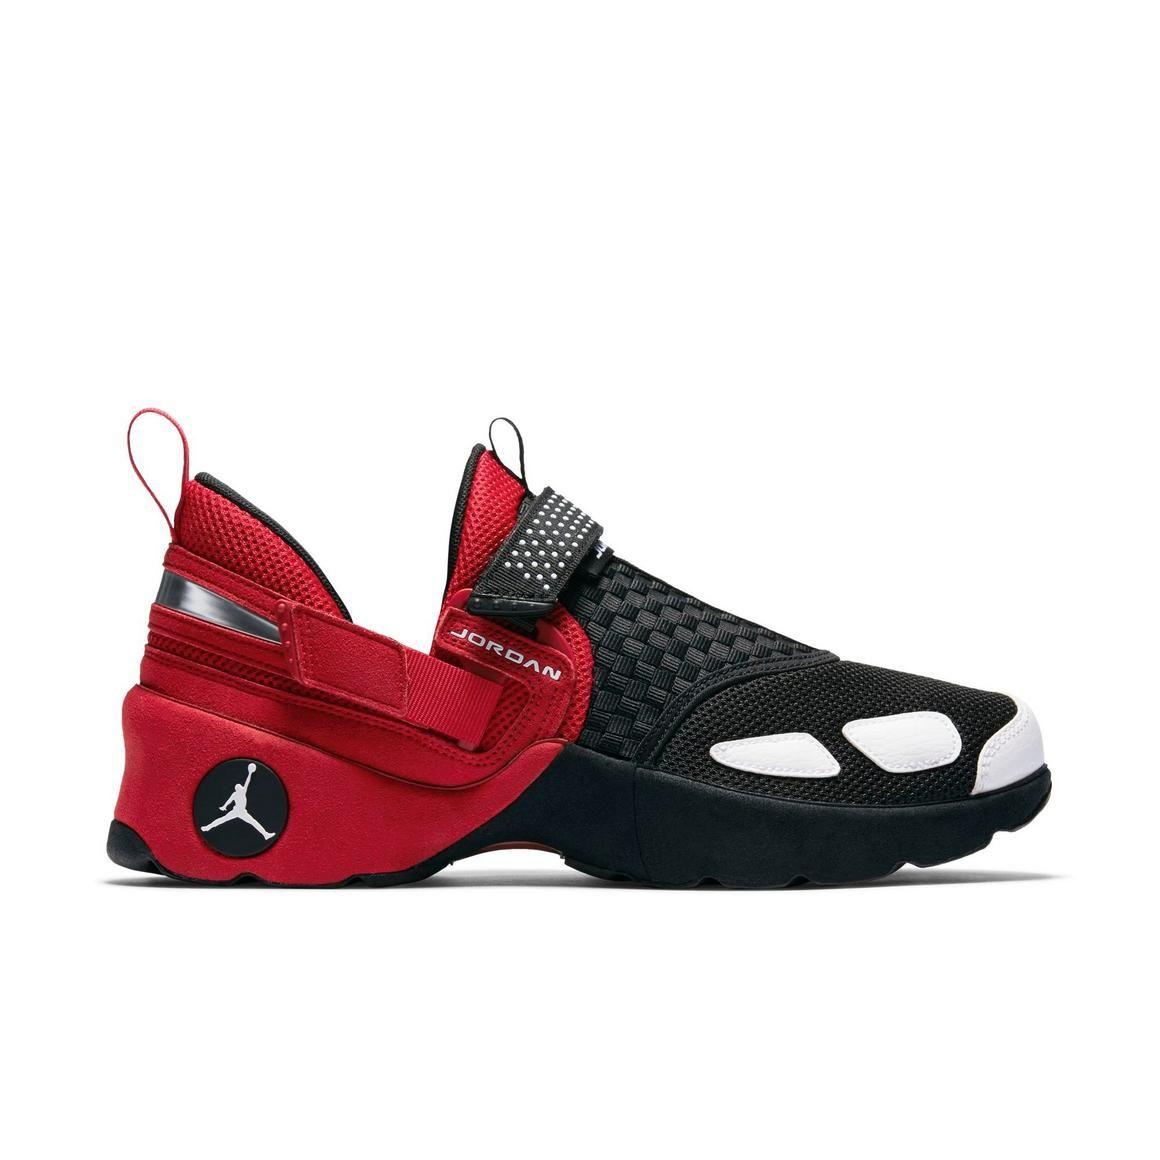 Jordan Trunner LX Men's Shoe Shoes mens, Shoes, Jordans